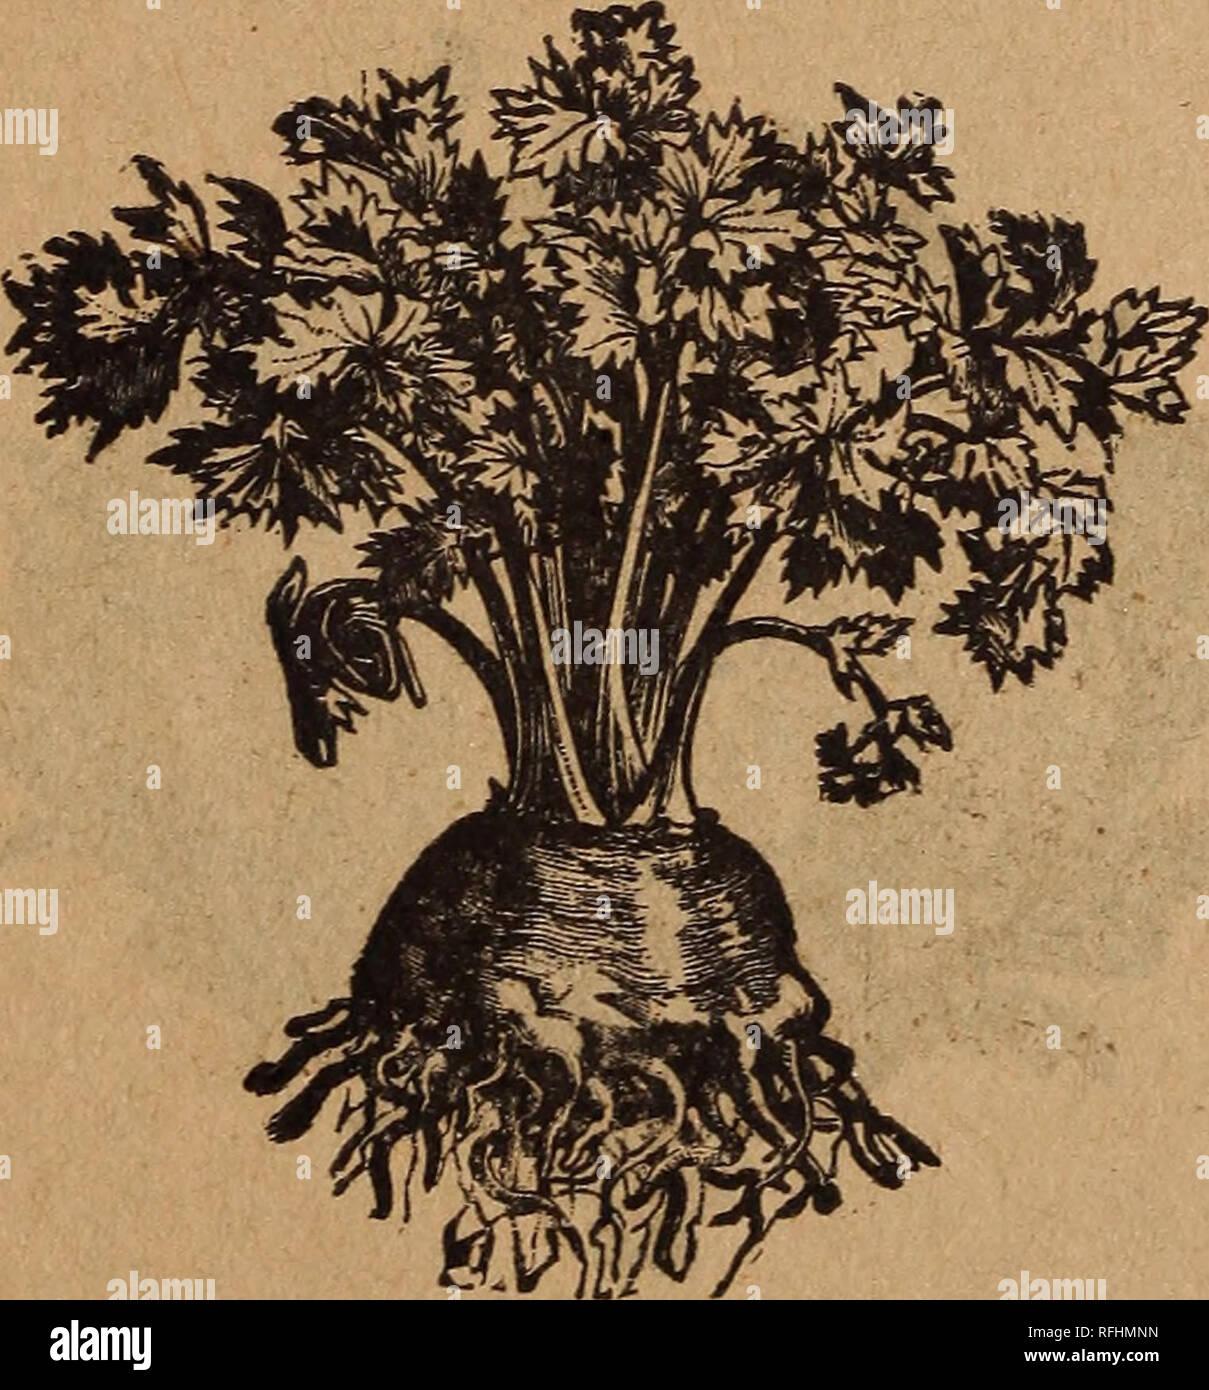 . Garden and farm seeds. Nursery stock Wisconsin Milwaukee Catalogs; Vegetables Seeds Catalogs; Flowers Seeds Catalogs; Agricultural implements Catalogs. %l)to. ffojs, 287 @ro»e etrafje, ättitnmuree, 5Bi§. 14 ^flanjeburd) bic gäbjgfett au§ ftd^ felbft in §0= bem (Srabe ju bleicben. *£adet 5c, Unje 20c, i ^funb 65c, $fuub $2.15. , &avtwtlt'ä VßttUction. (Sine ber atlerbeften Sorten für ben SJcarft, ba er fid) ungemein gut hält, ©ebr feft unb niemals bofcl. *ßadet 5c, Uiue 15c, Vi $fb. 45c, Pfb. fl.40. Söetfter äUnme, SSon oorgugtidjer Qualität. $acfet 5c, Unje 20c, Vi $fb.65c, Sßfb. $18.0.  - Stock Image